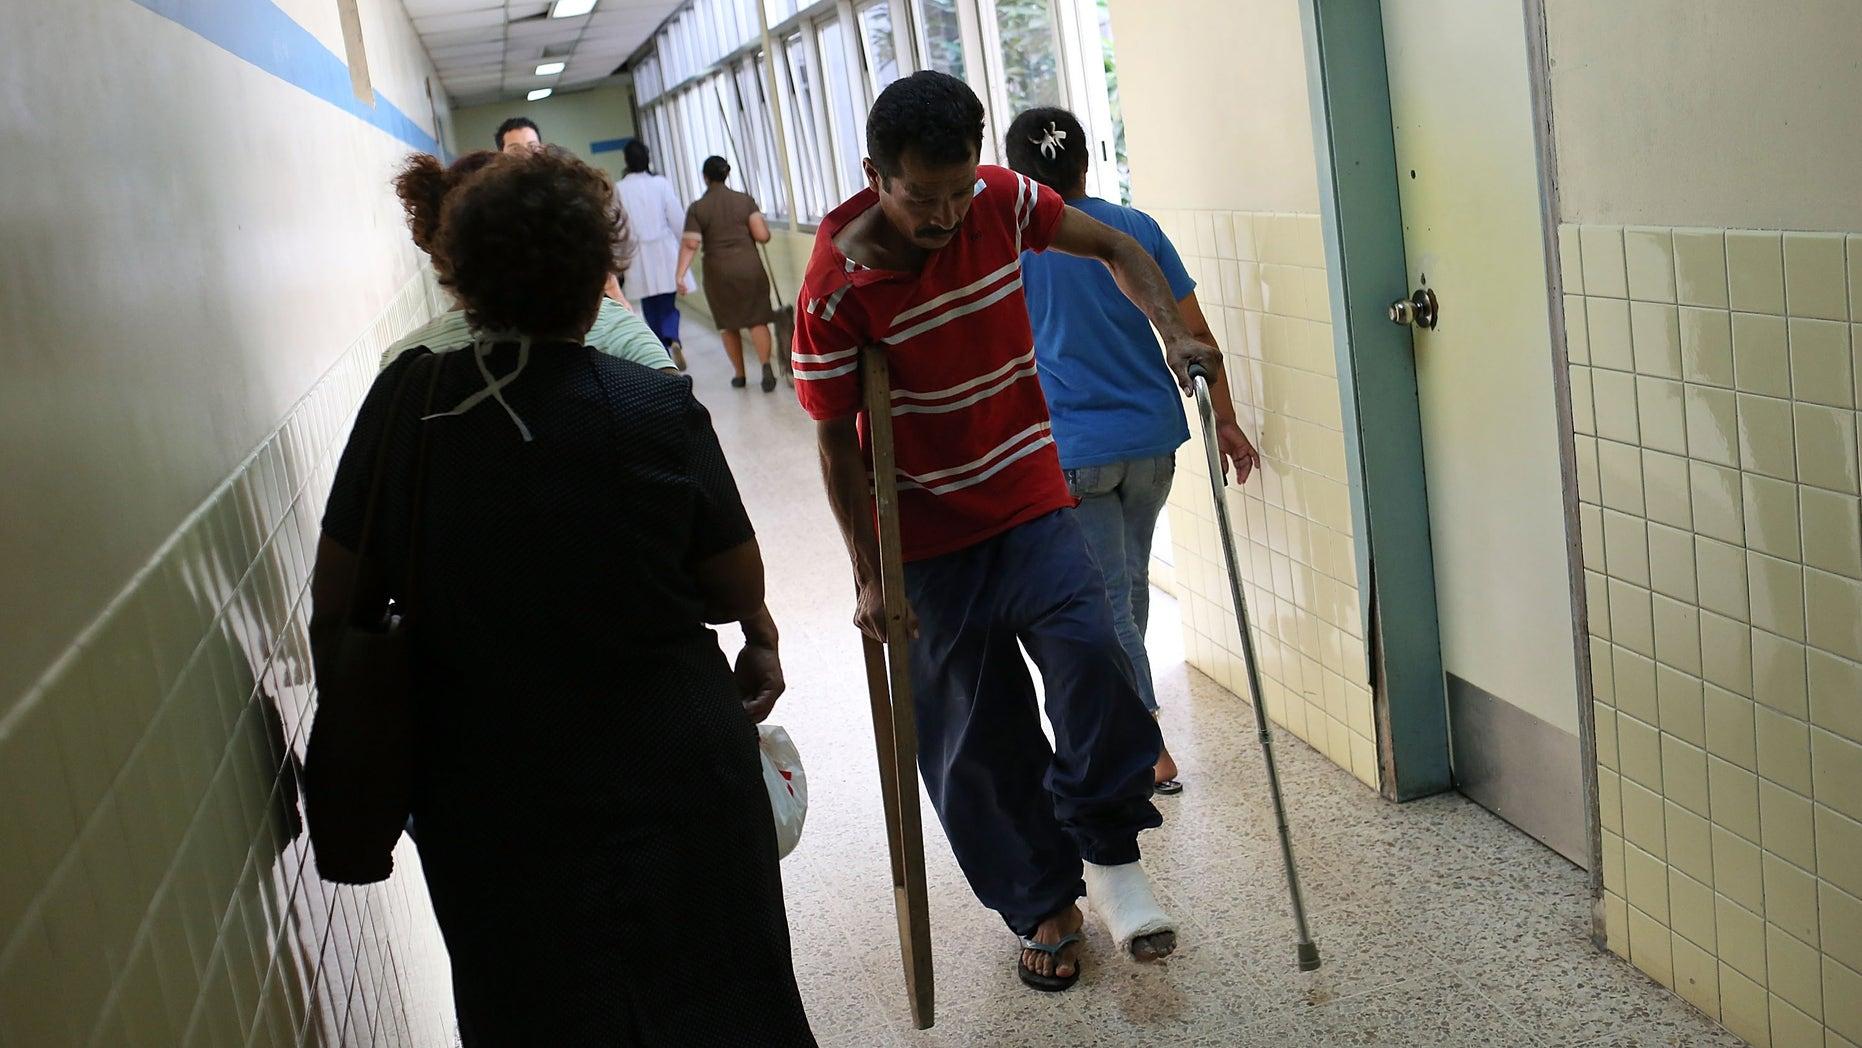 A man limps through the hallways of a public hospital on July 19, 2012 in Tegucigalpa, Honduras.